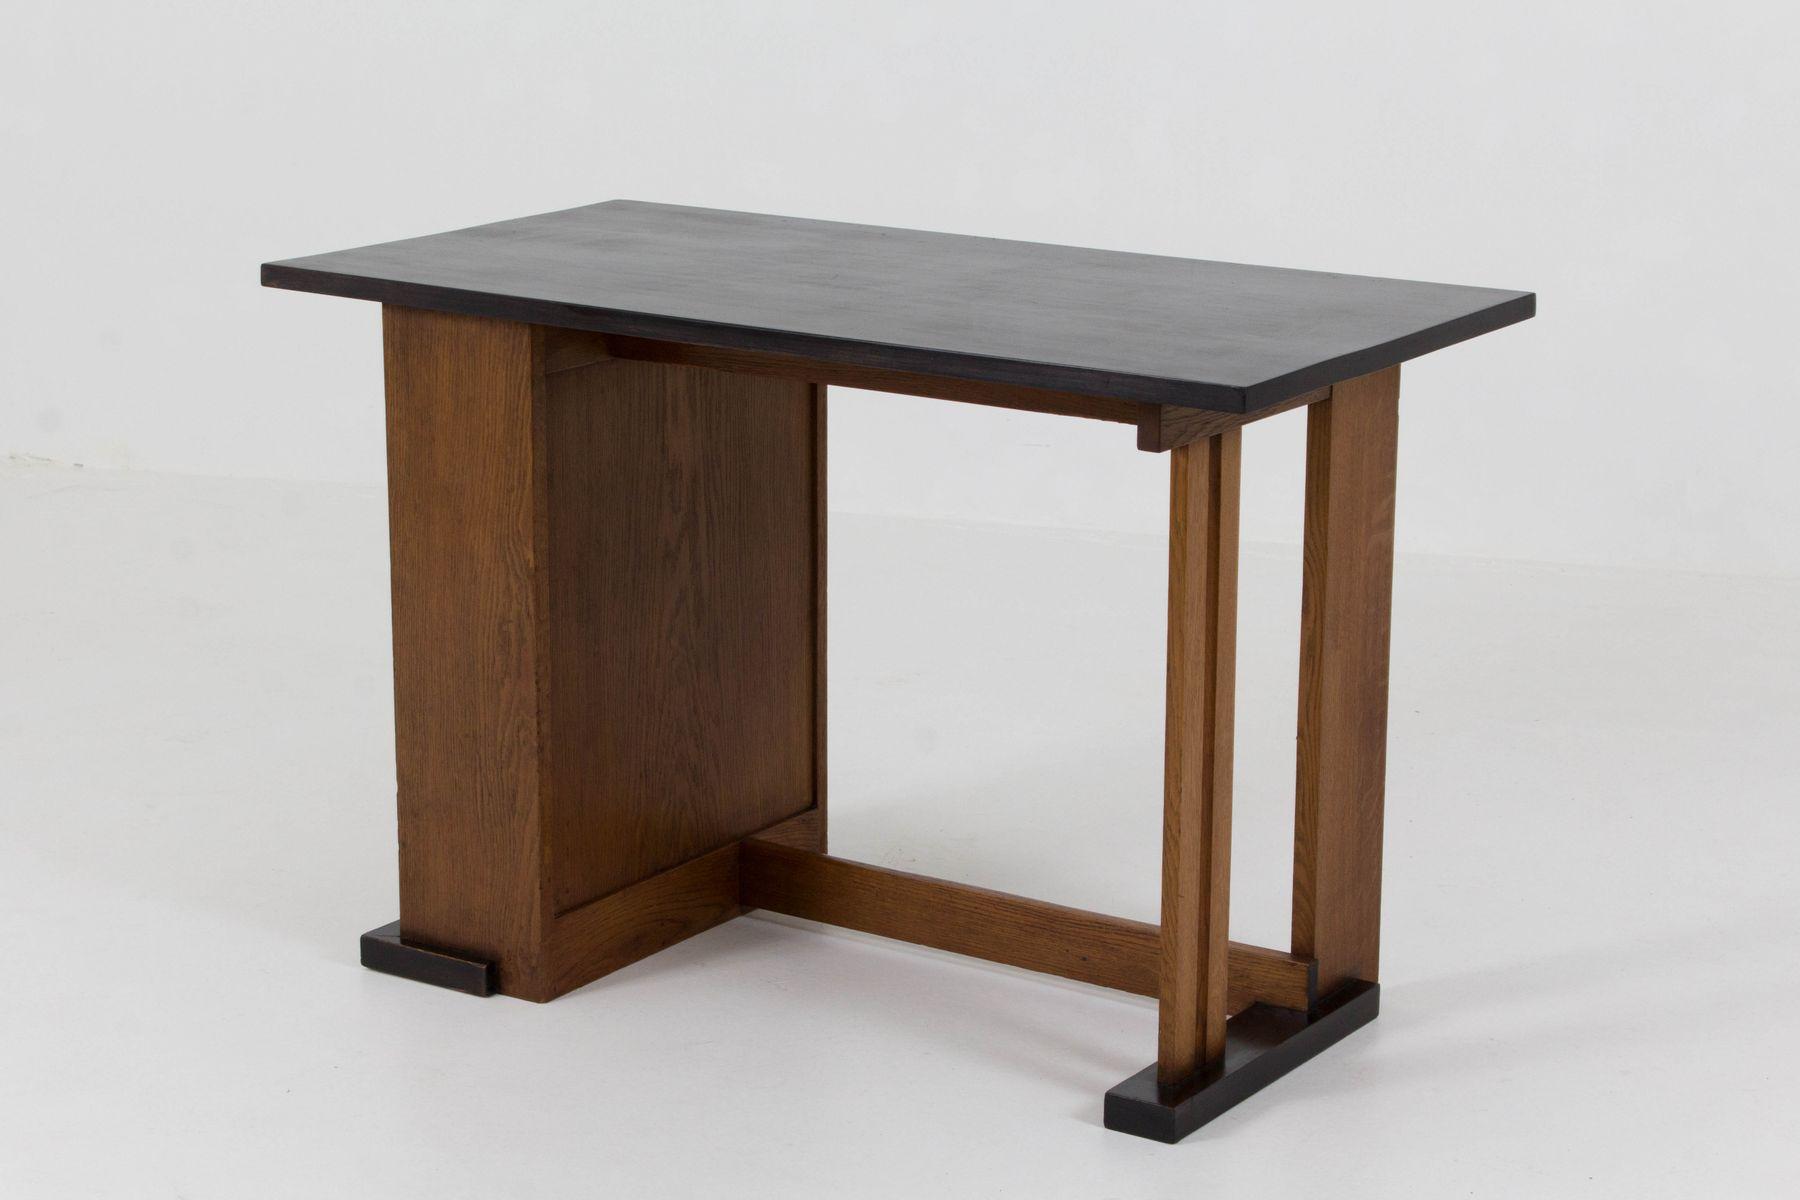 art deco haager schule schreibtisch von cor alons f r l o. Black Bedroom Furniture Sets. Home Design Ideas